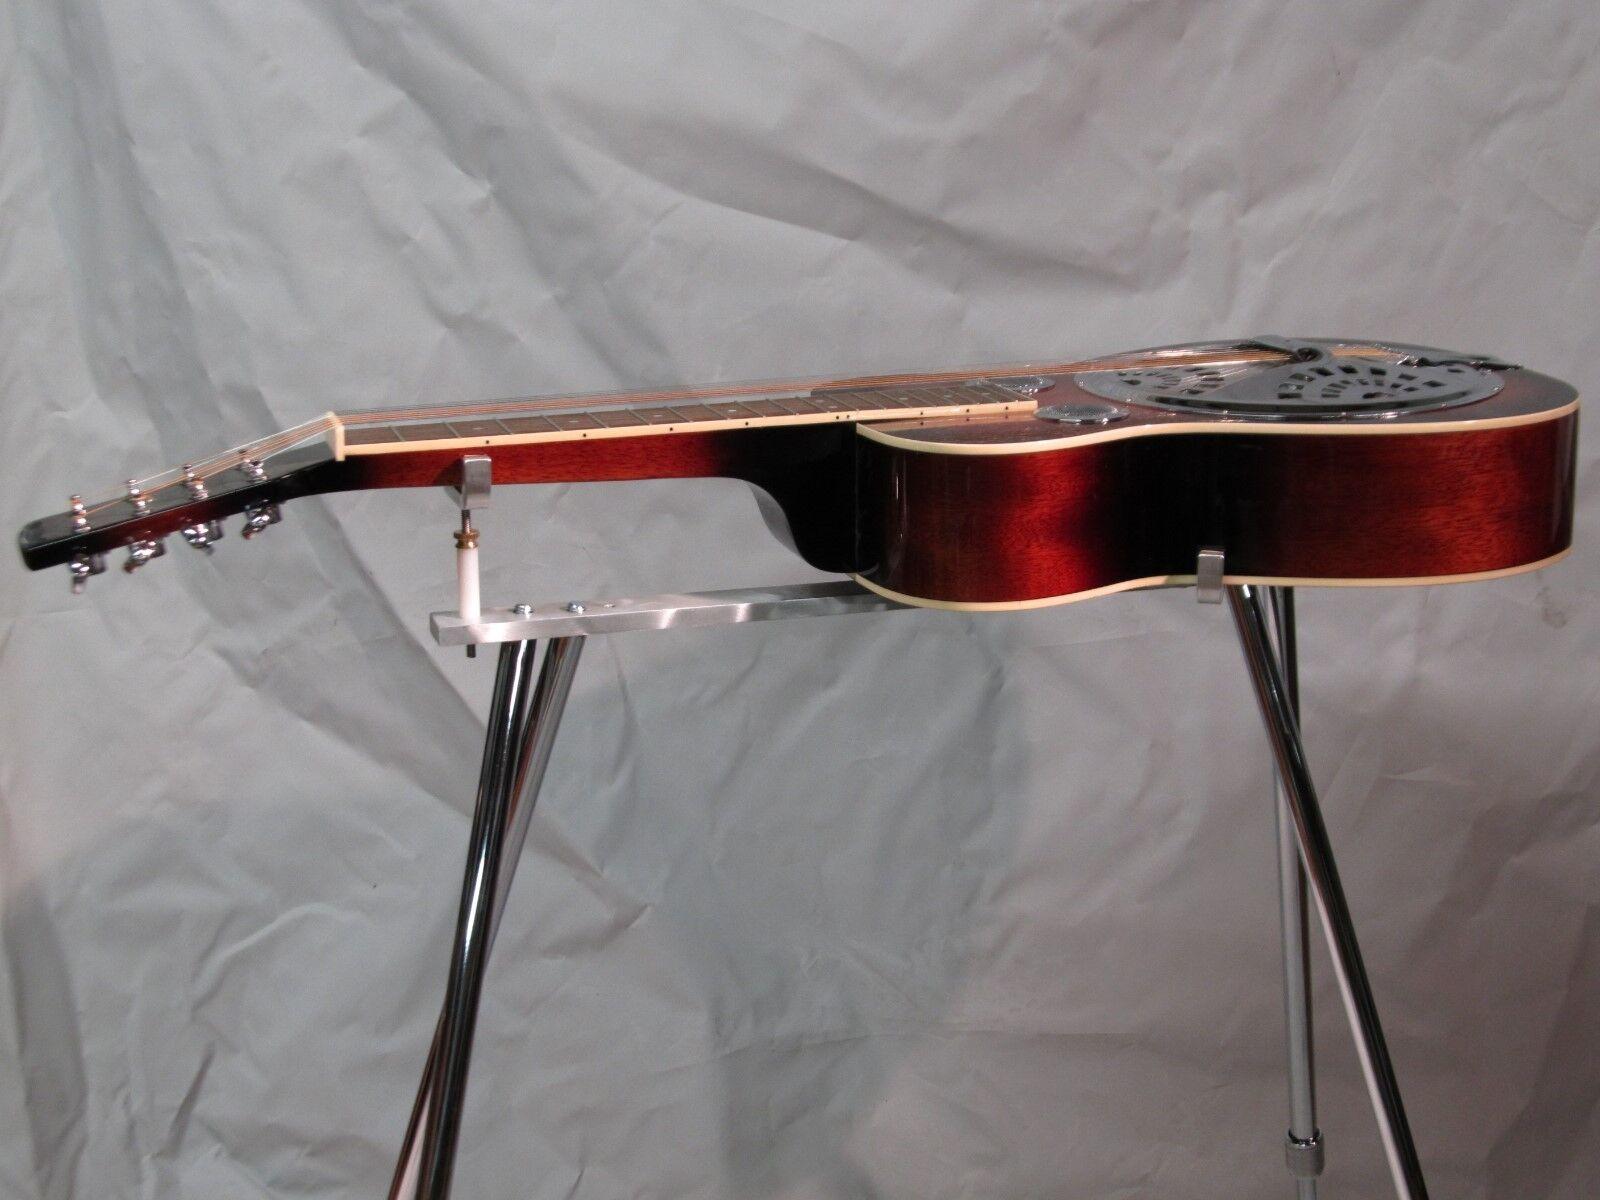 Resonator Lap Steel Guitar Stand Musical Instrument Stand Universal 4 Legs